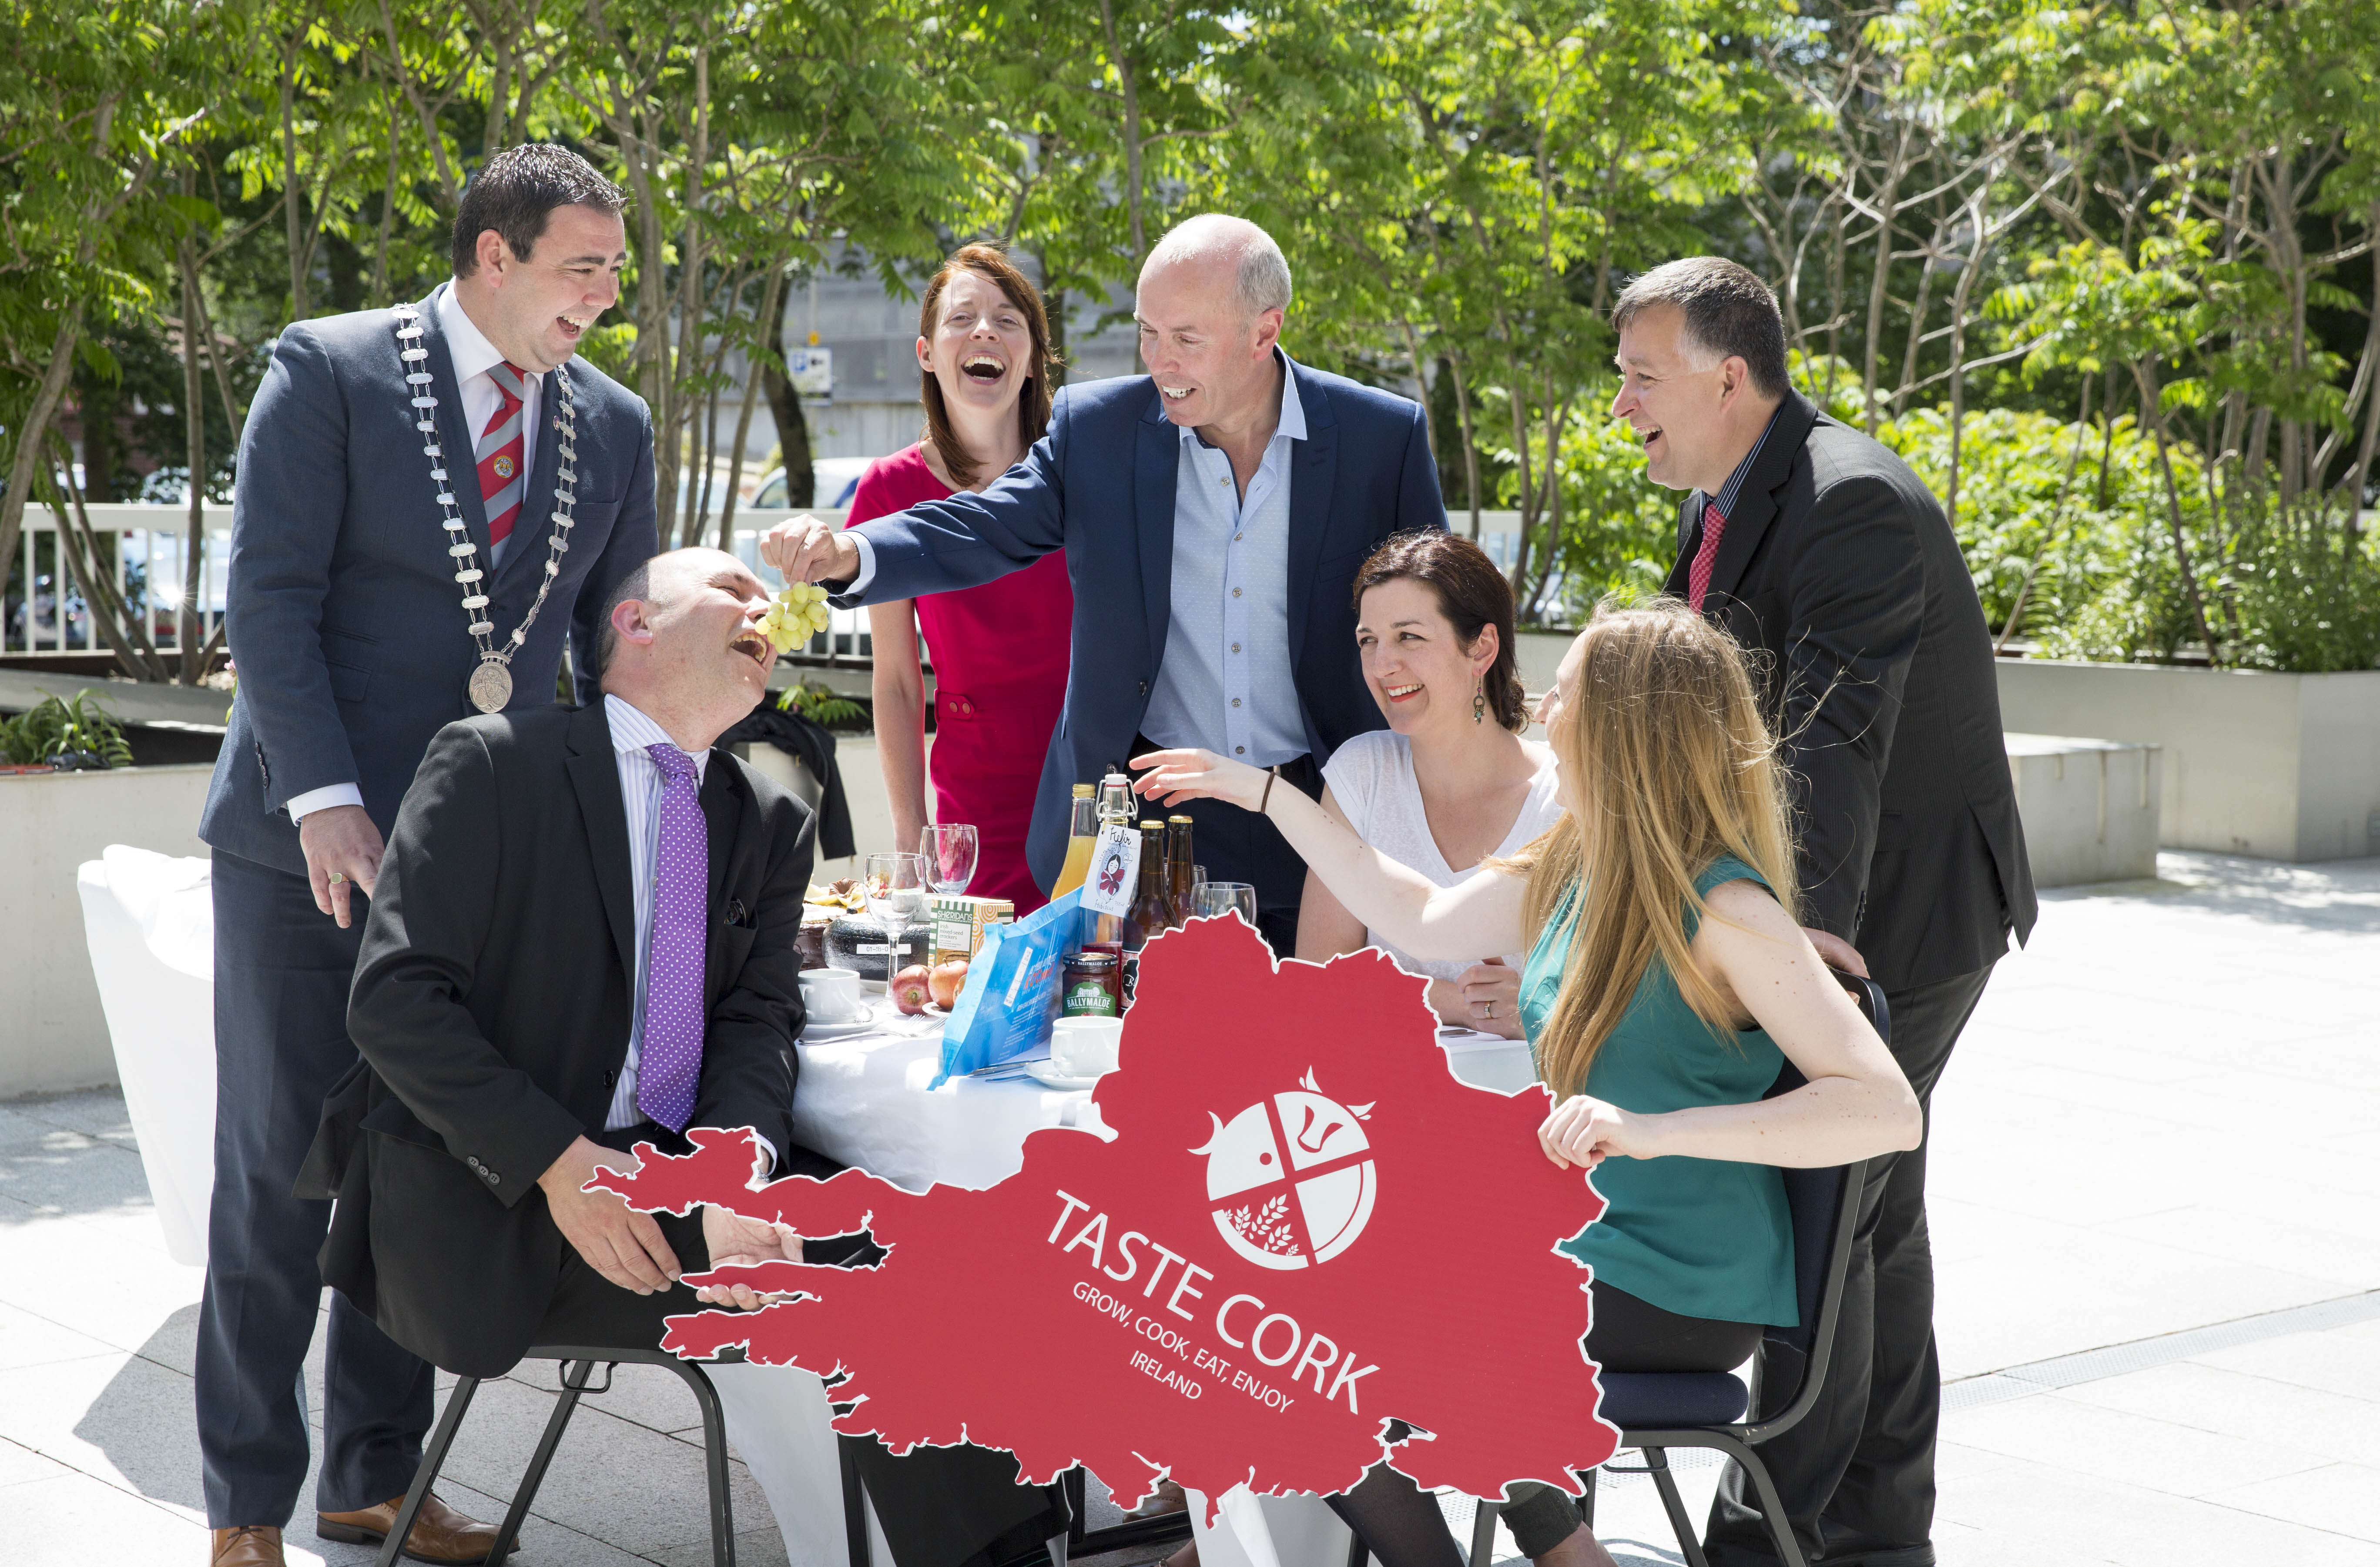 Taste Cork to Lead County's Foodie Culture